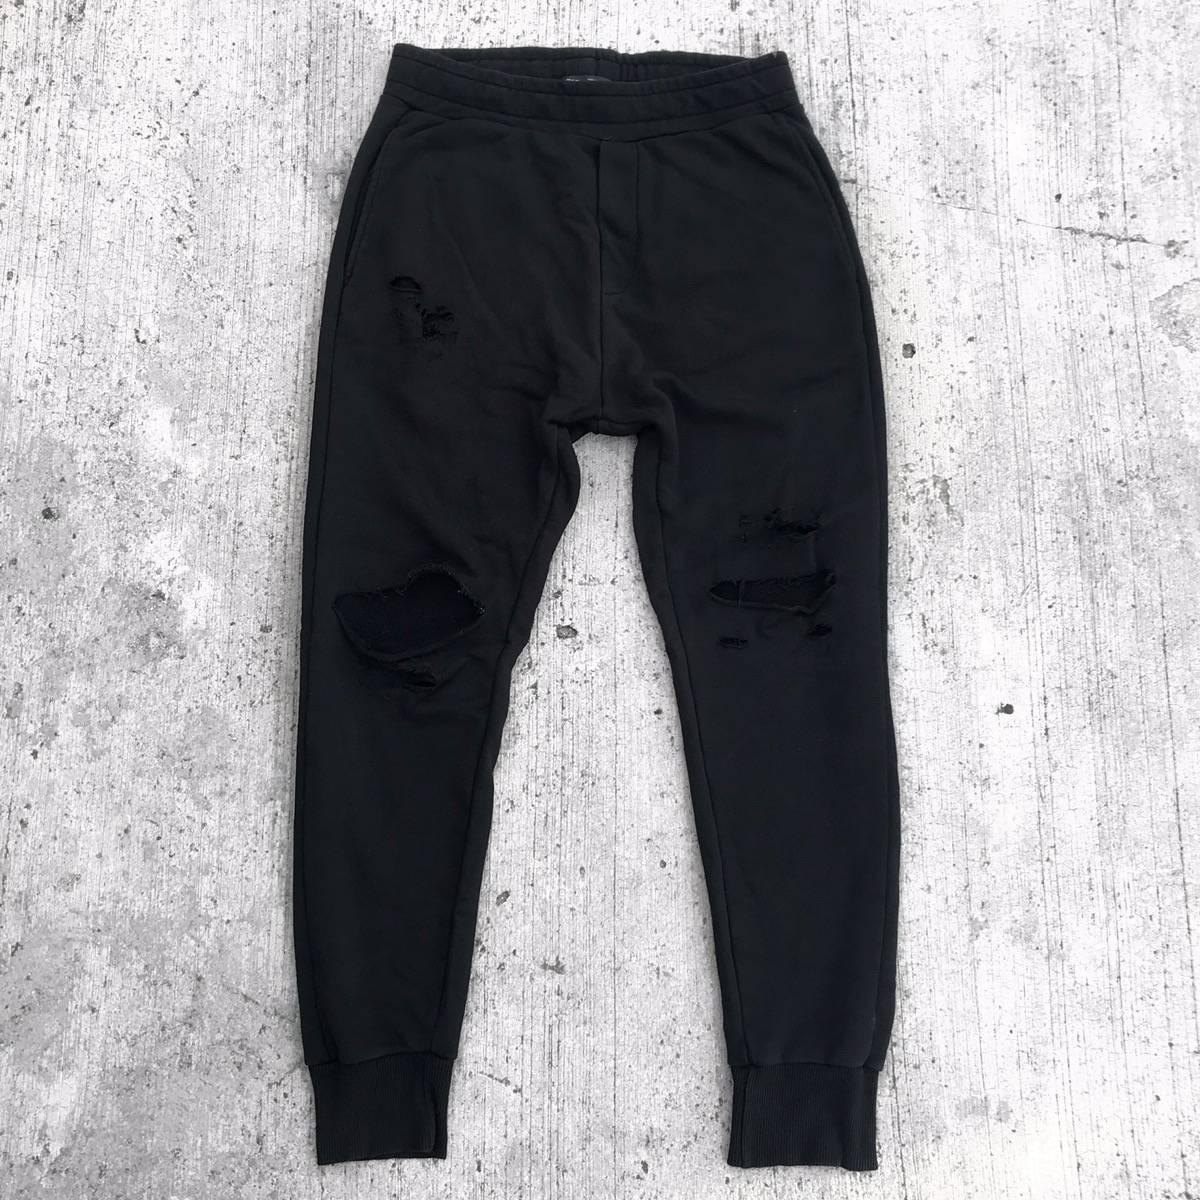 689beab1 Zara Zara Distress Sweatpants | Gucci Lv Prada Fendi Versace | Grailed